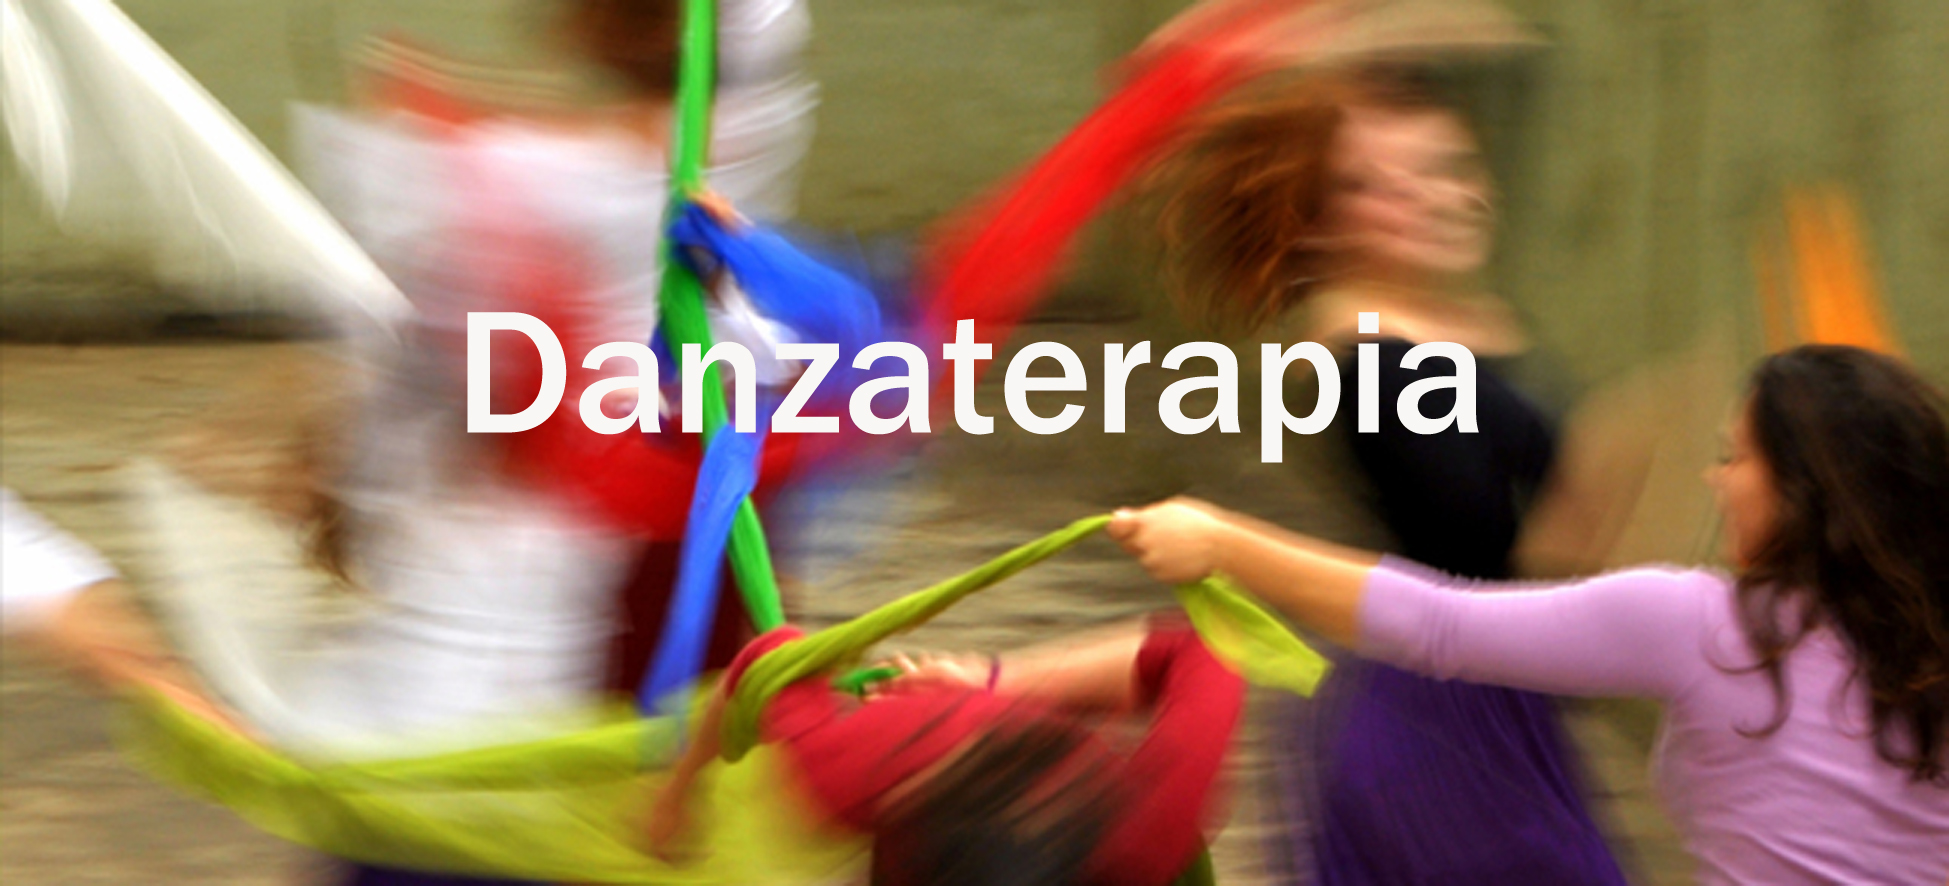 danzaterapiaa publi taller web.jpg